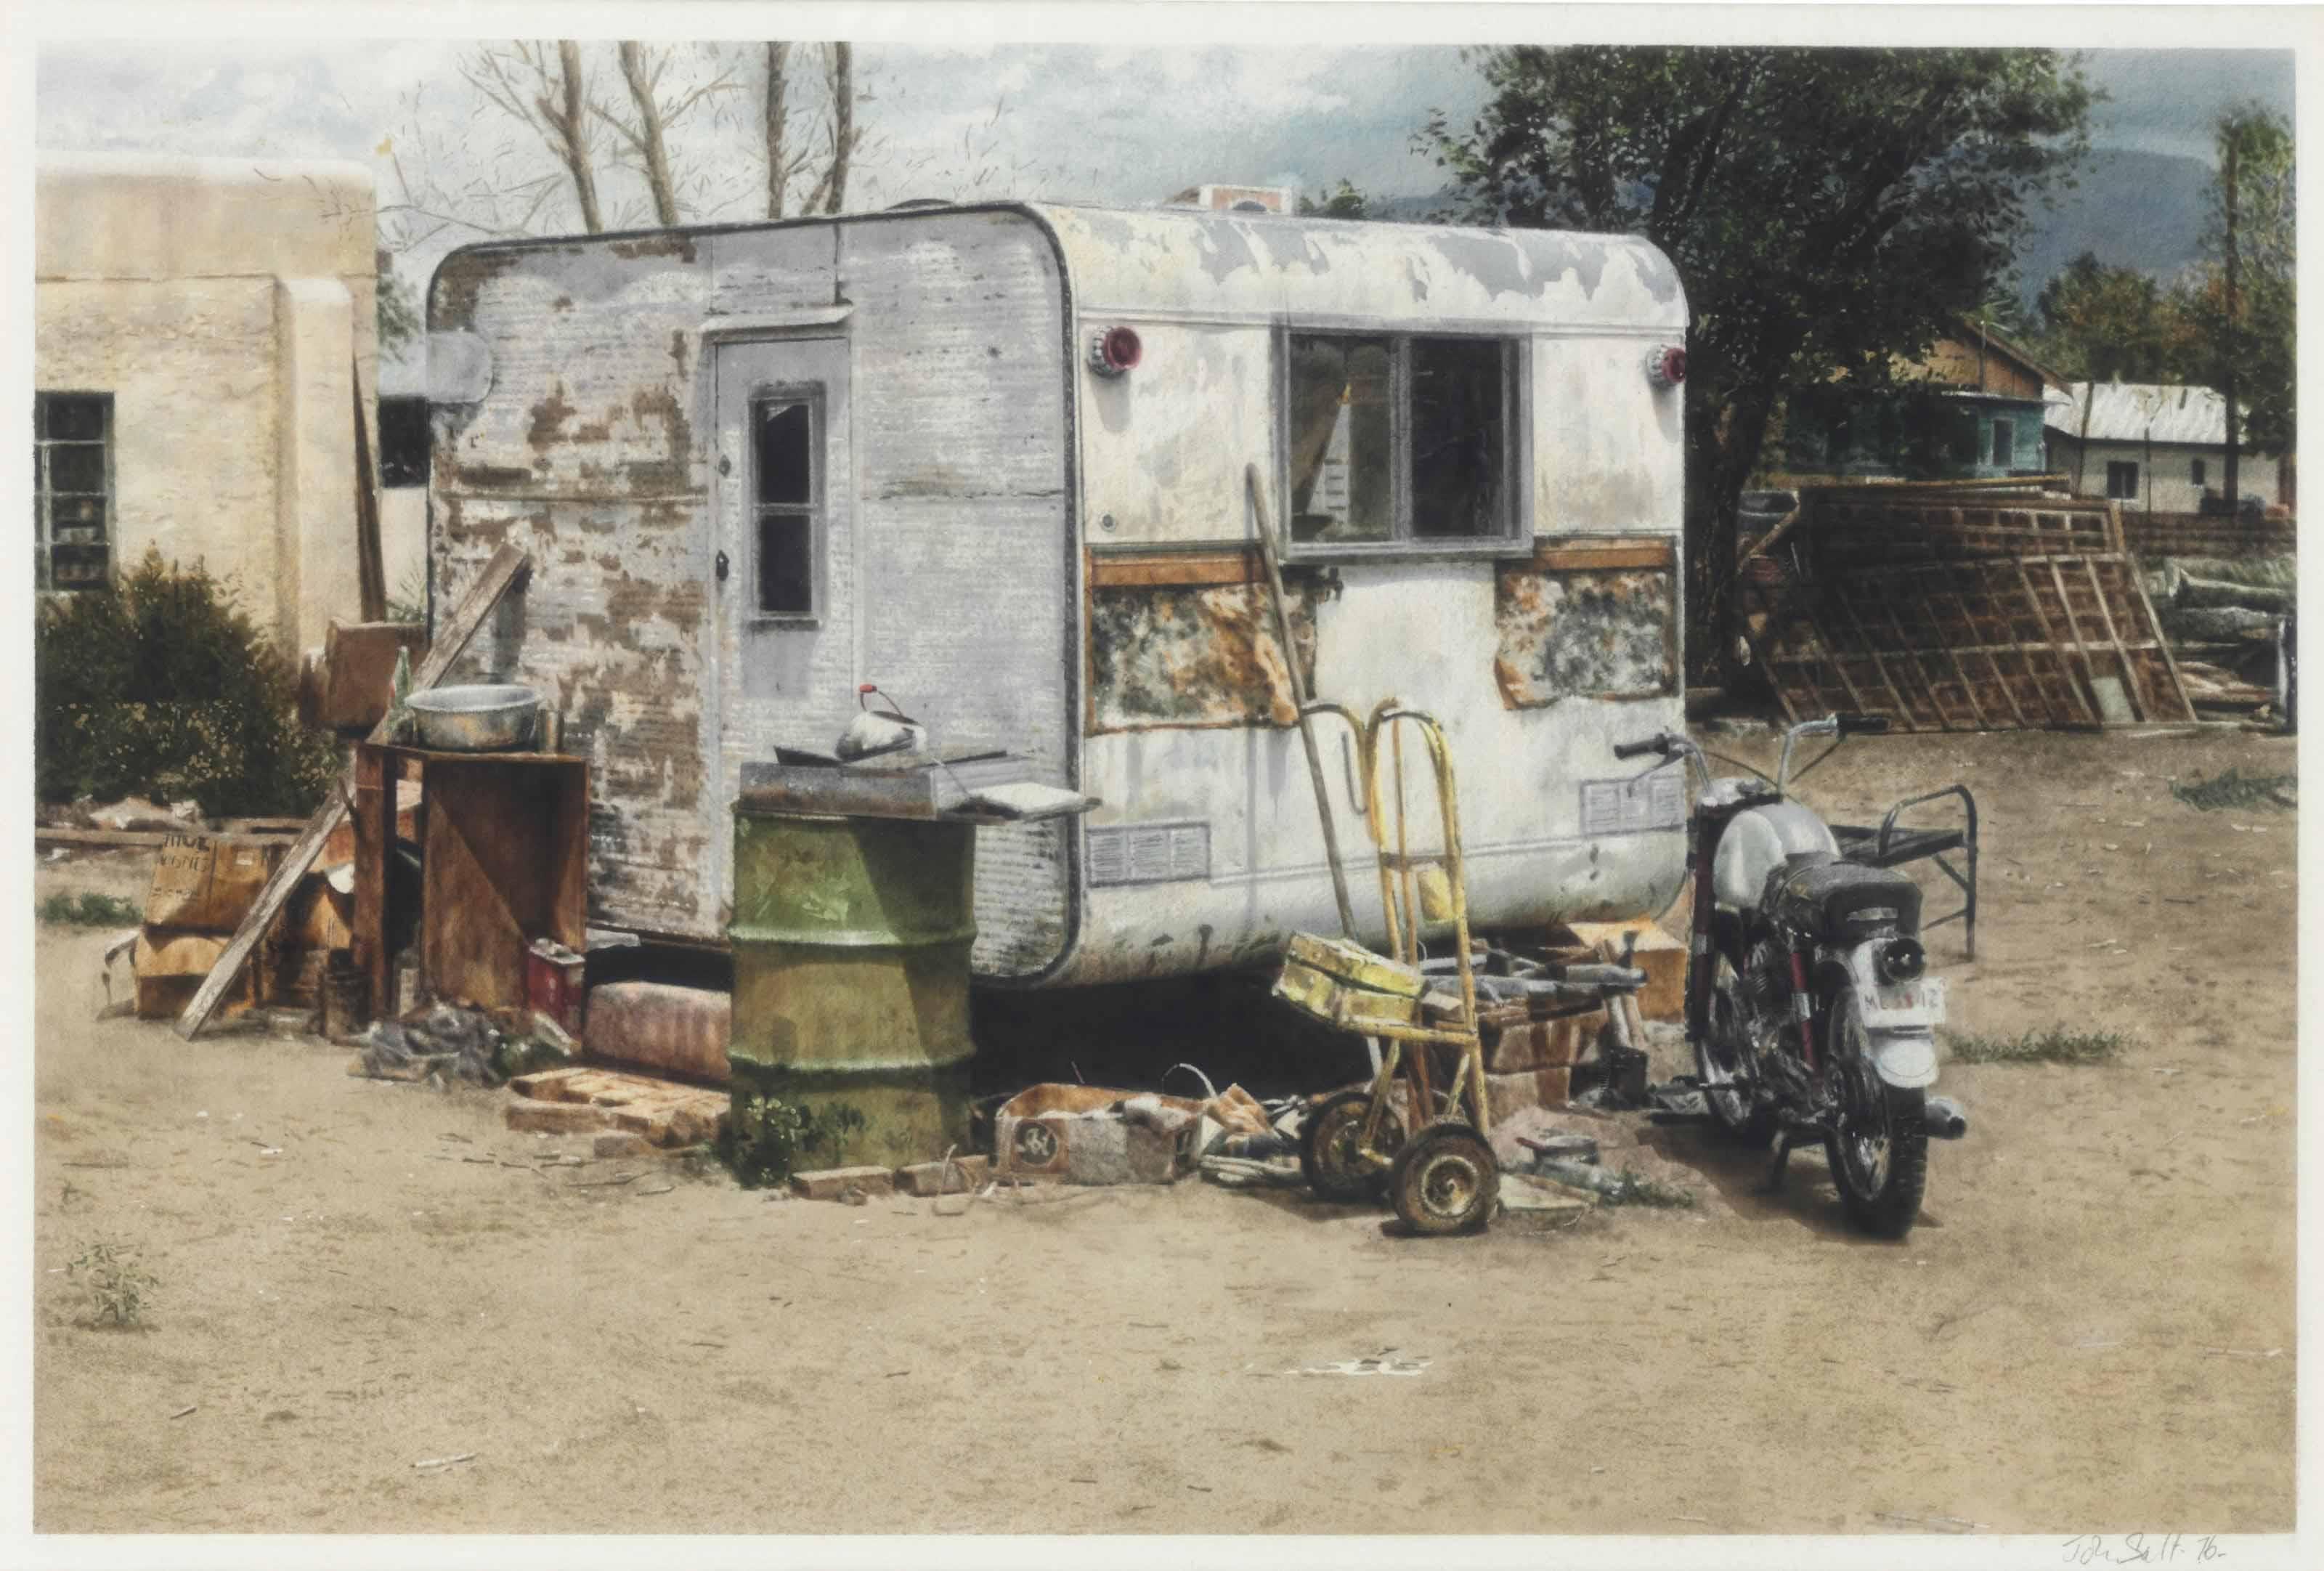 White Trailer House